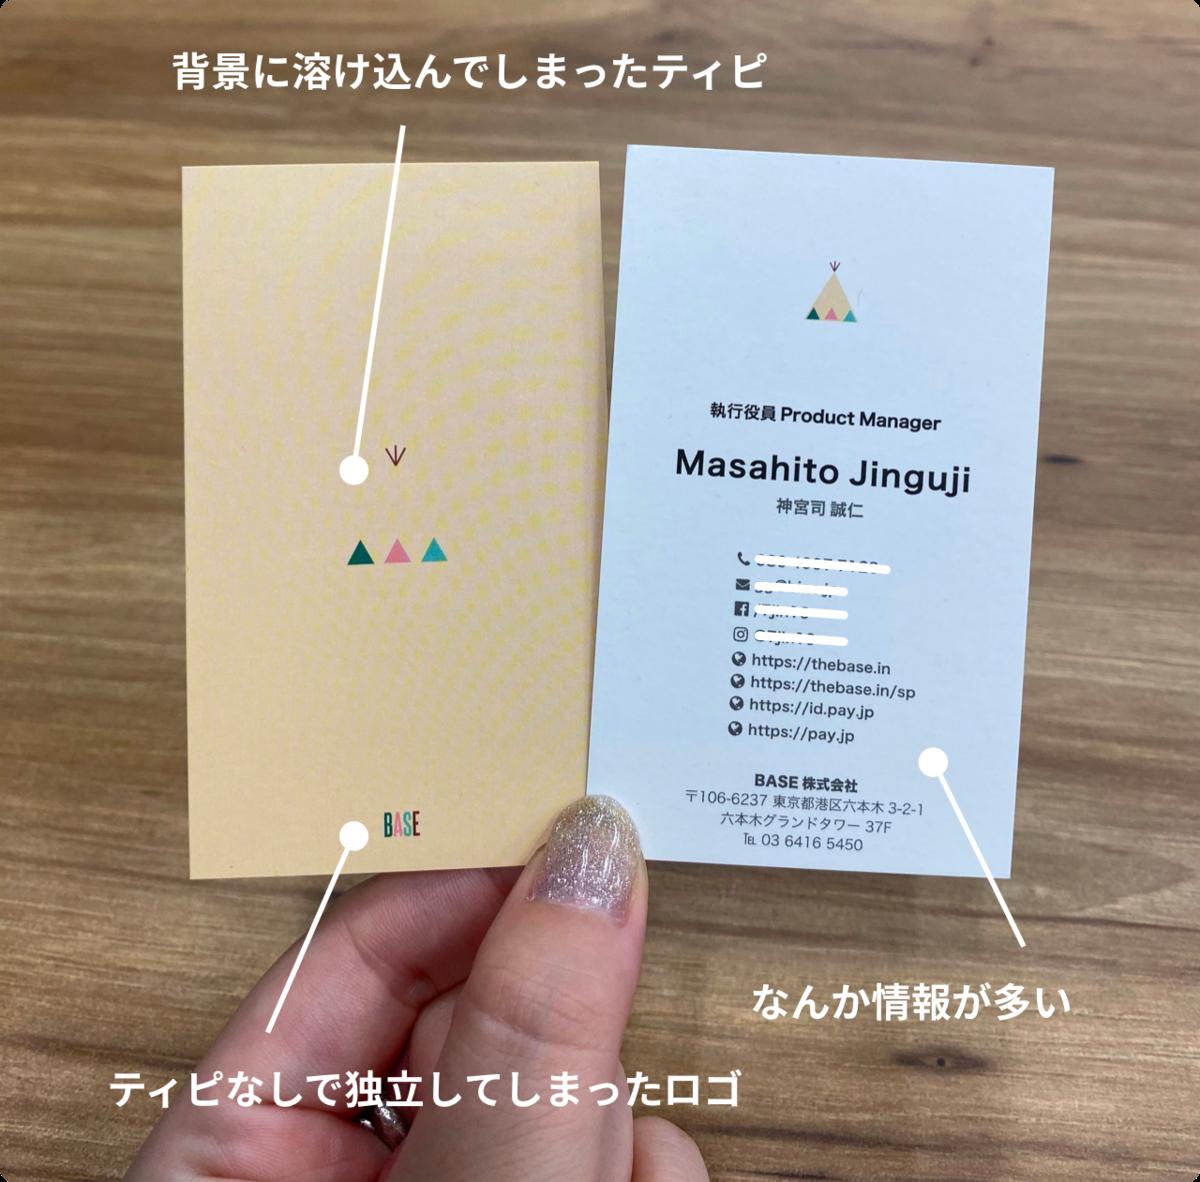 f:id:aiyoneda:20191119131112p:plain